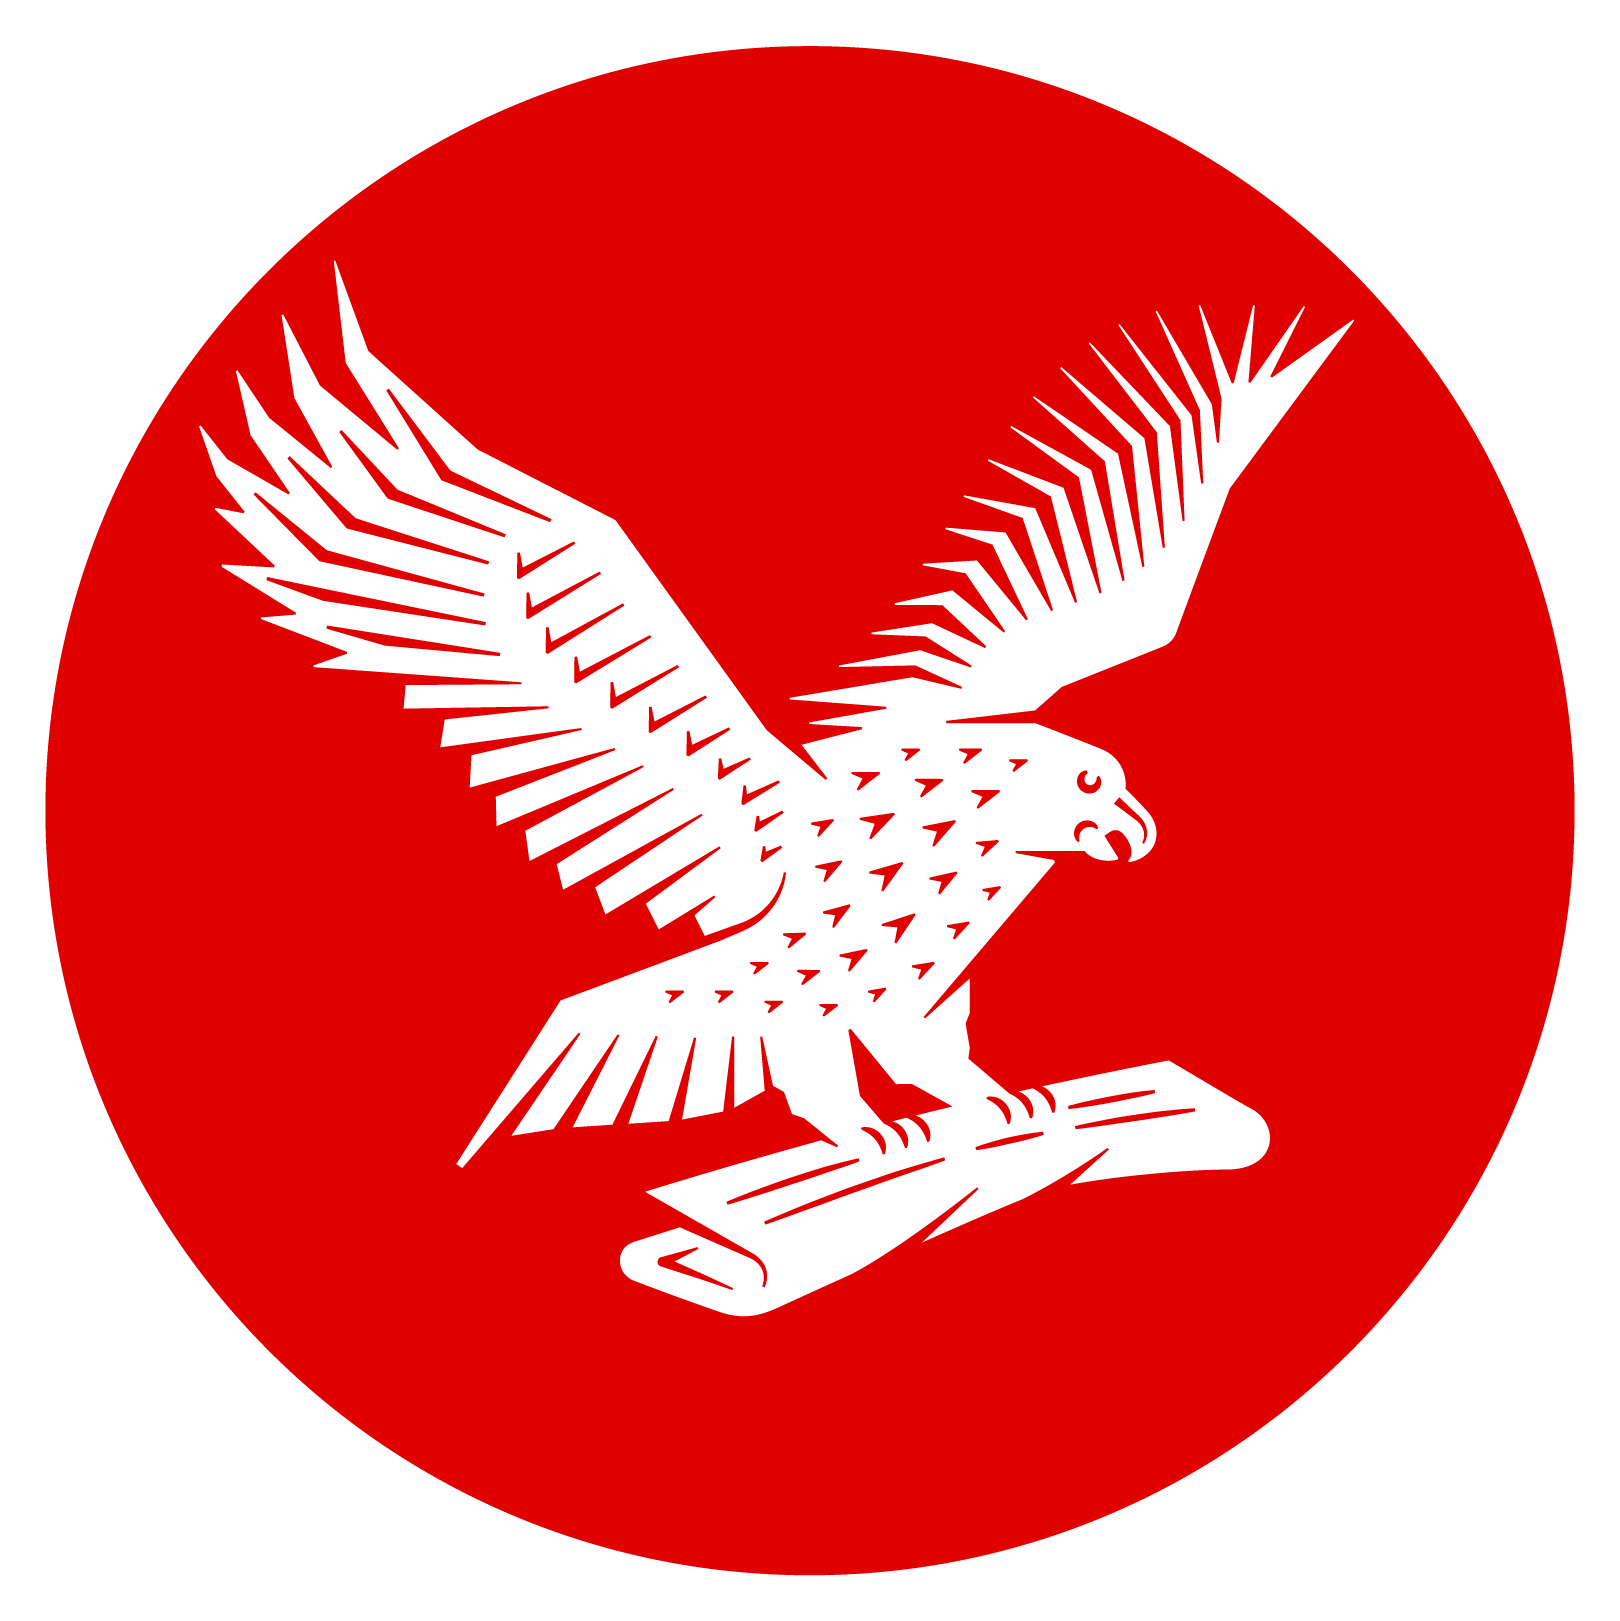 latigre indy eagle